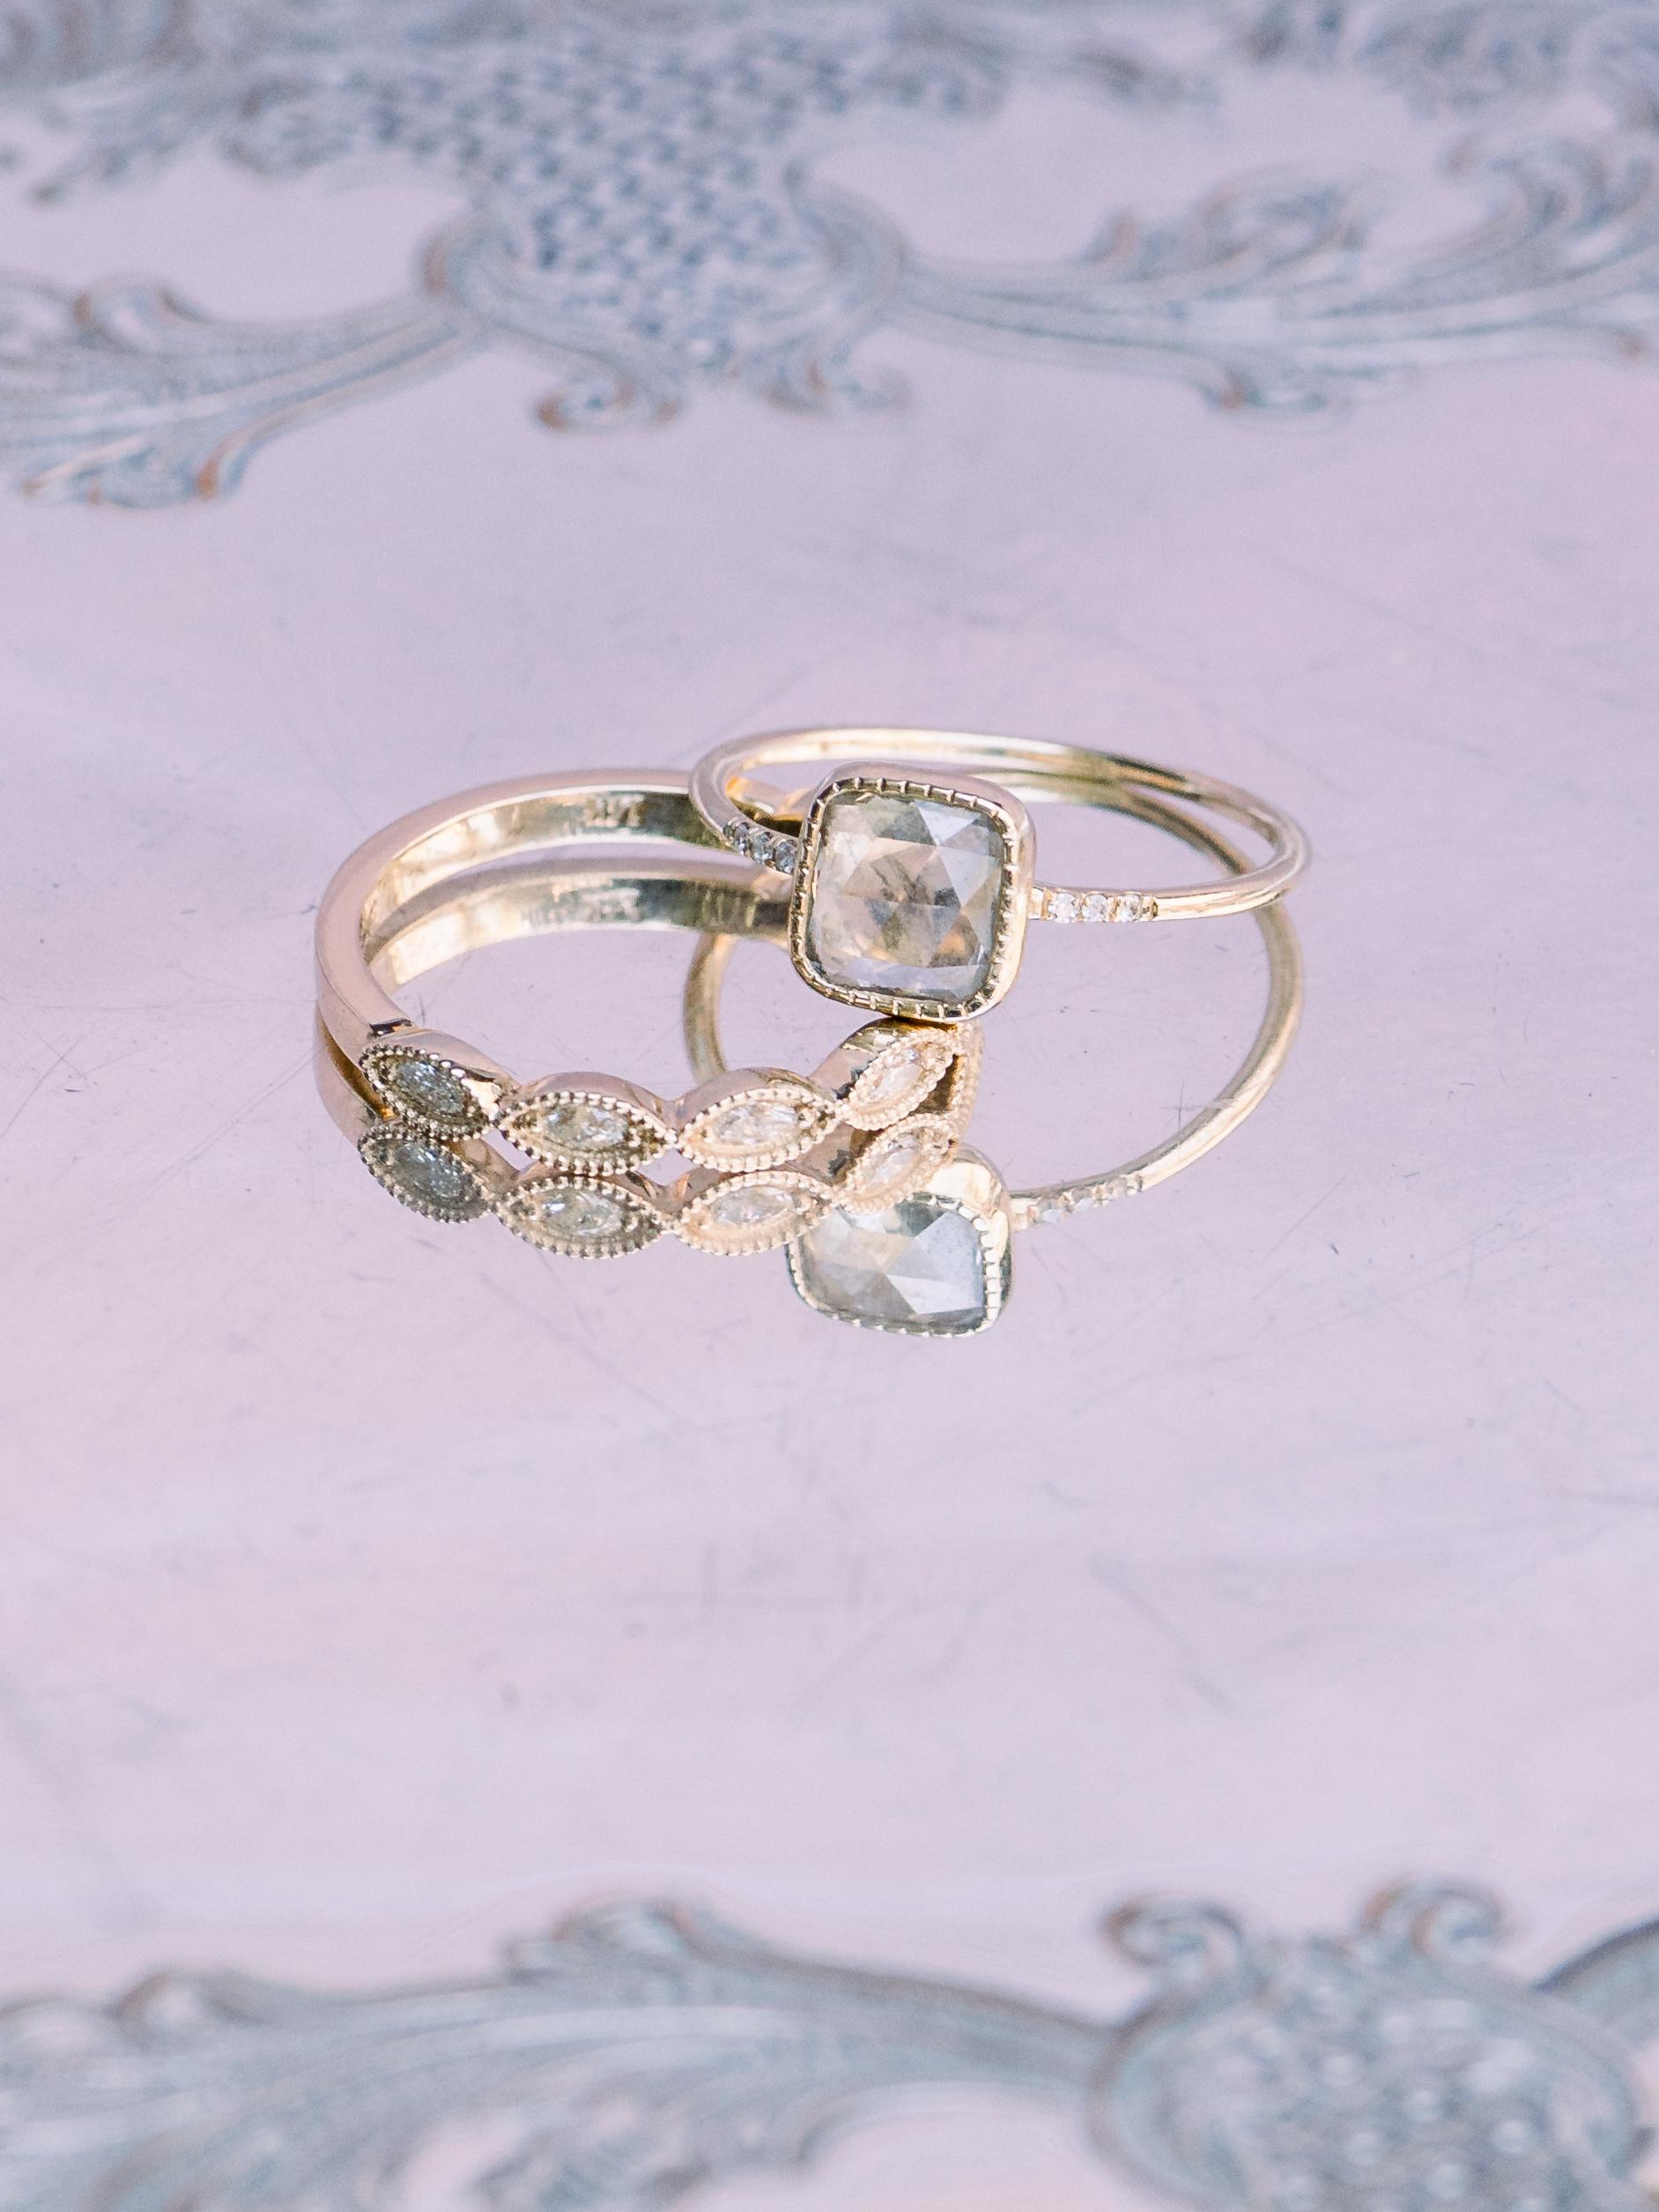 rose-gold-diamond-wedding-ring.jpg